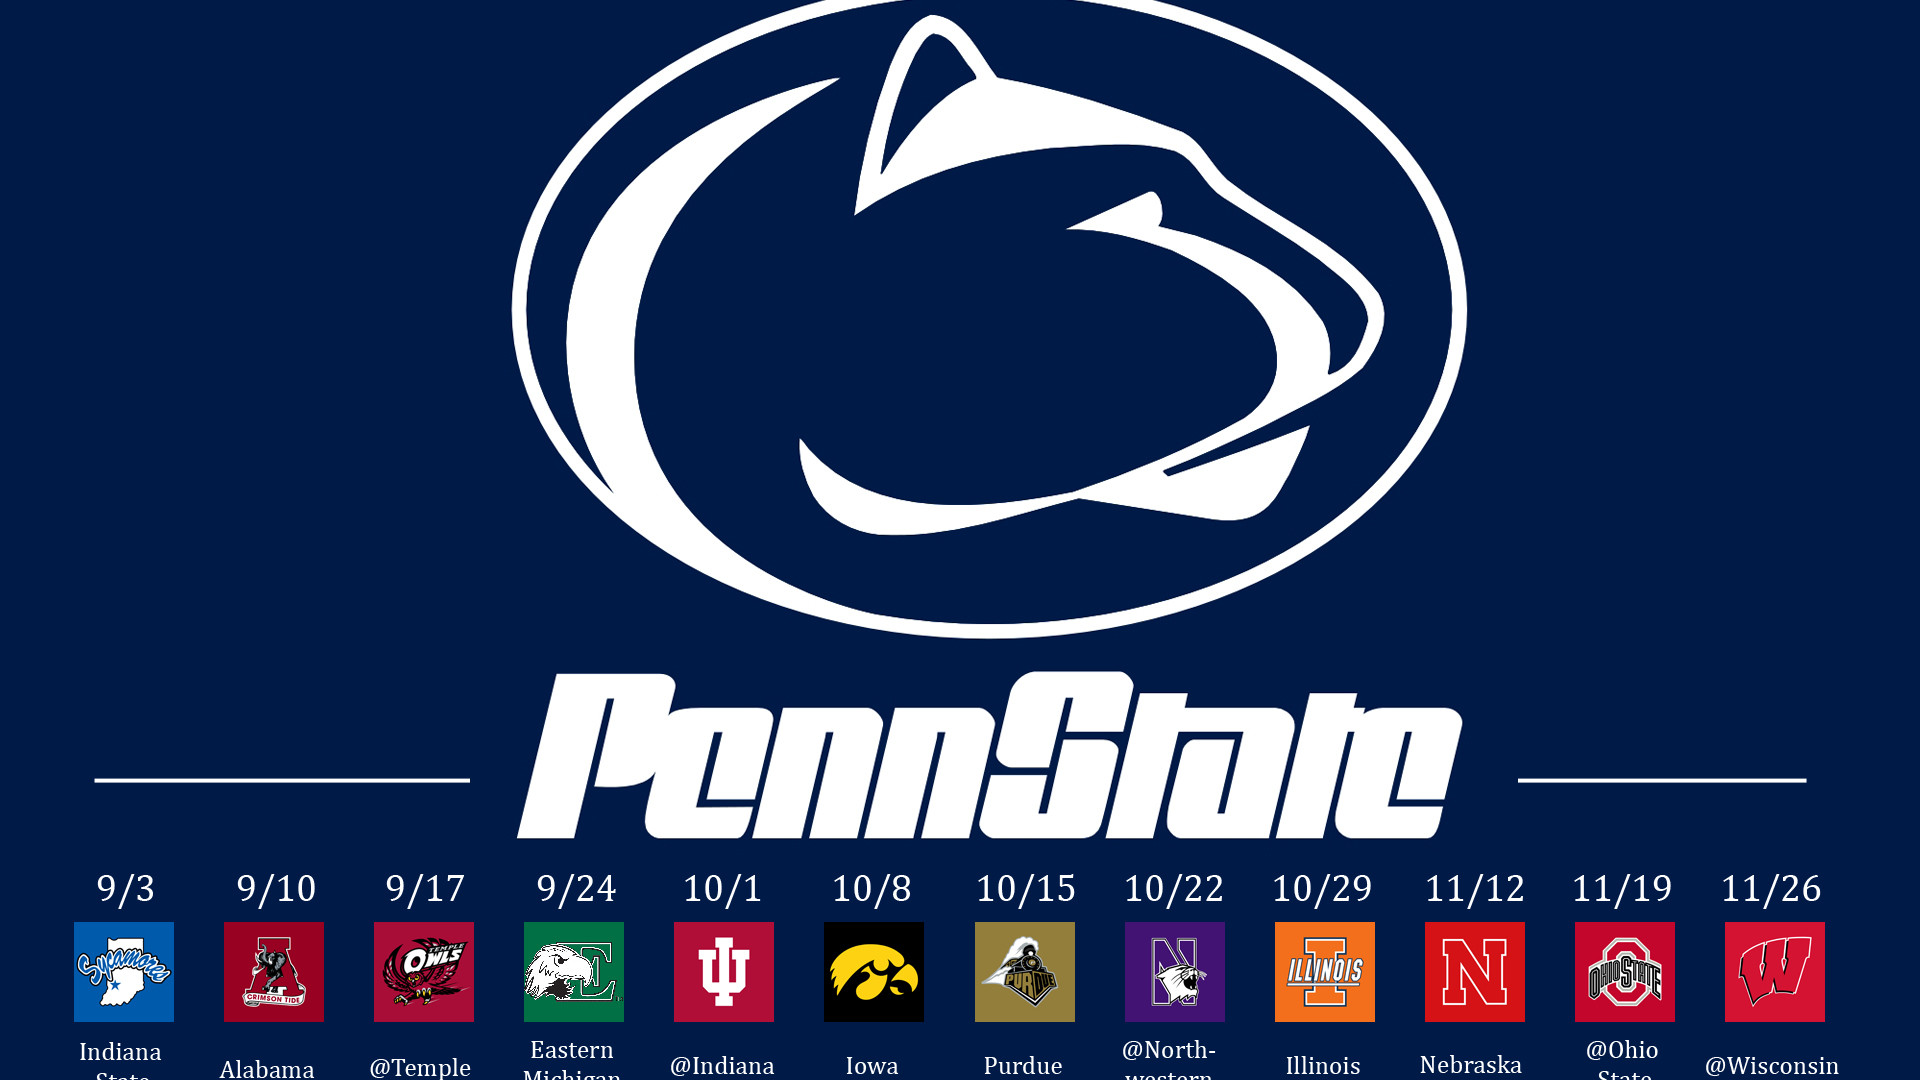 Hd Wallpapers Penn State University Logo 1920 X 1200 487 Kb Jpeg   HD .